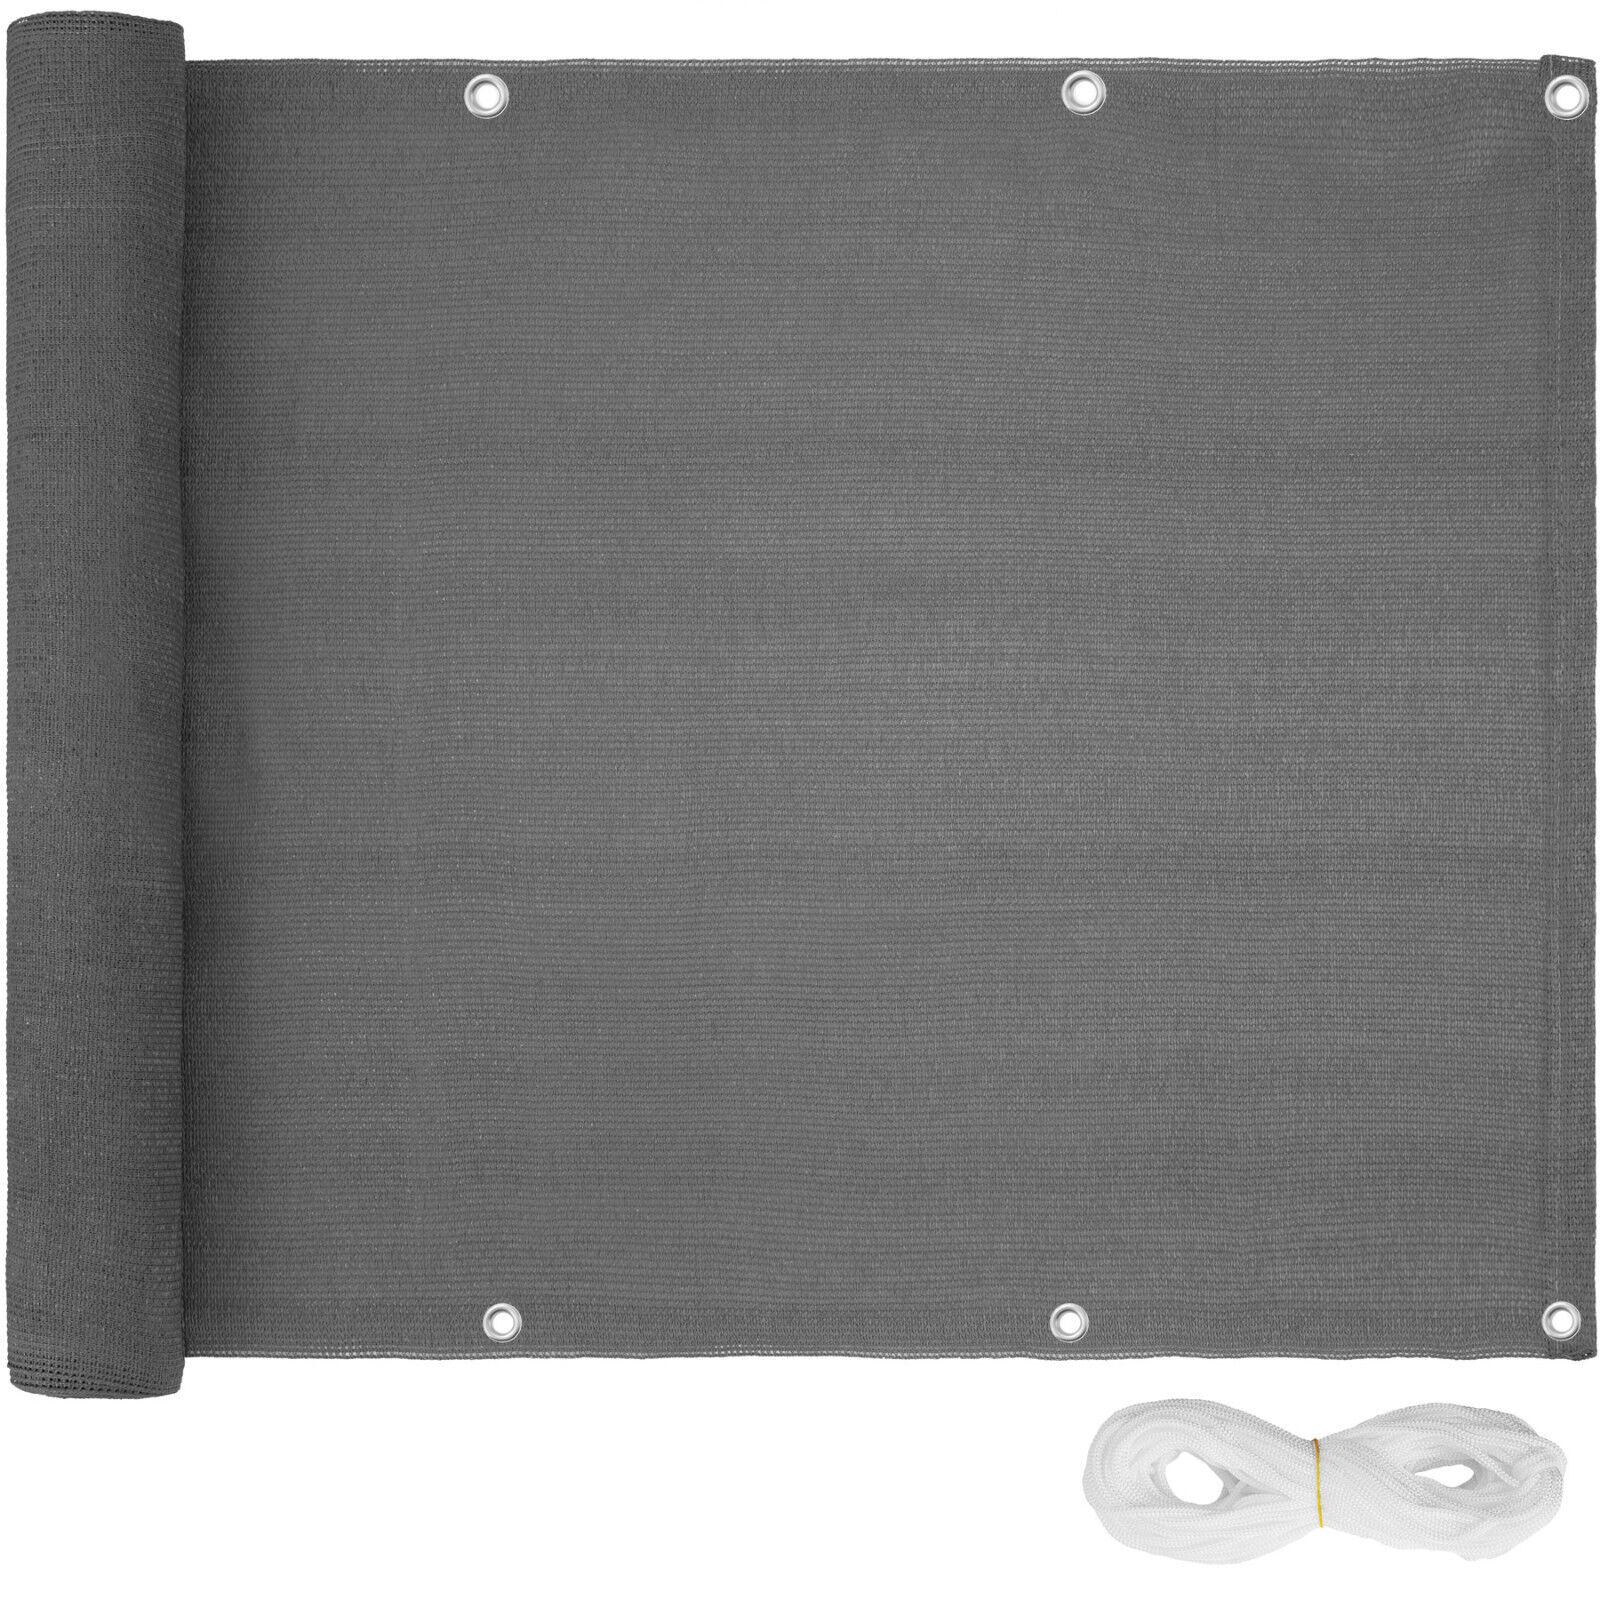 Balkon Sichtschutz Balkonverkleidung Windschutz Zaun Sichtblende 90x500cm Grau